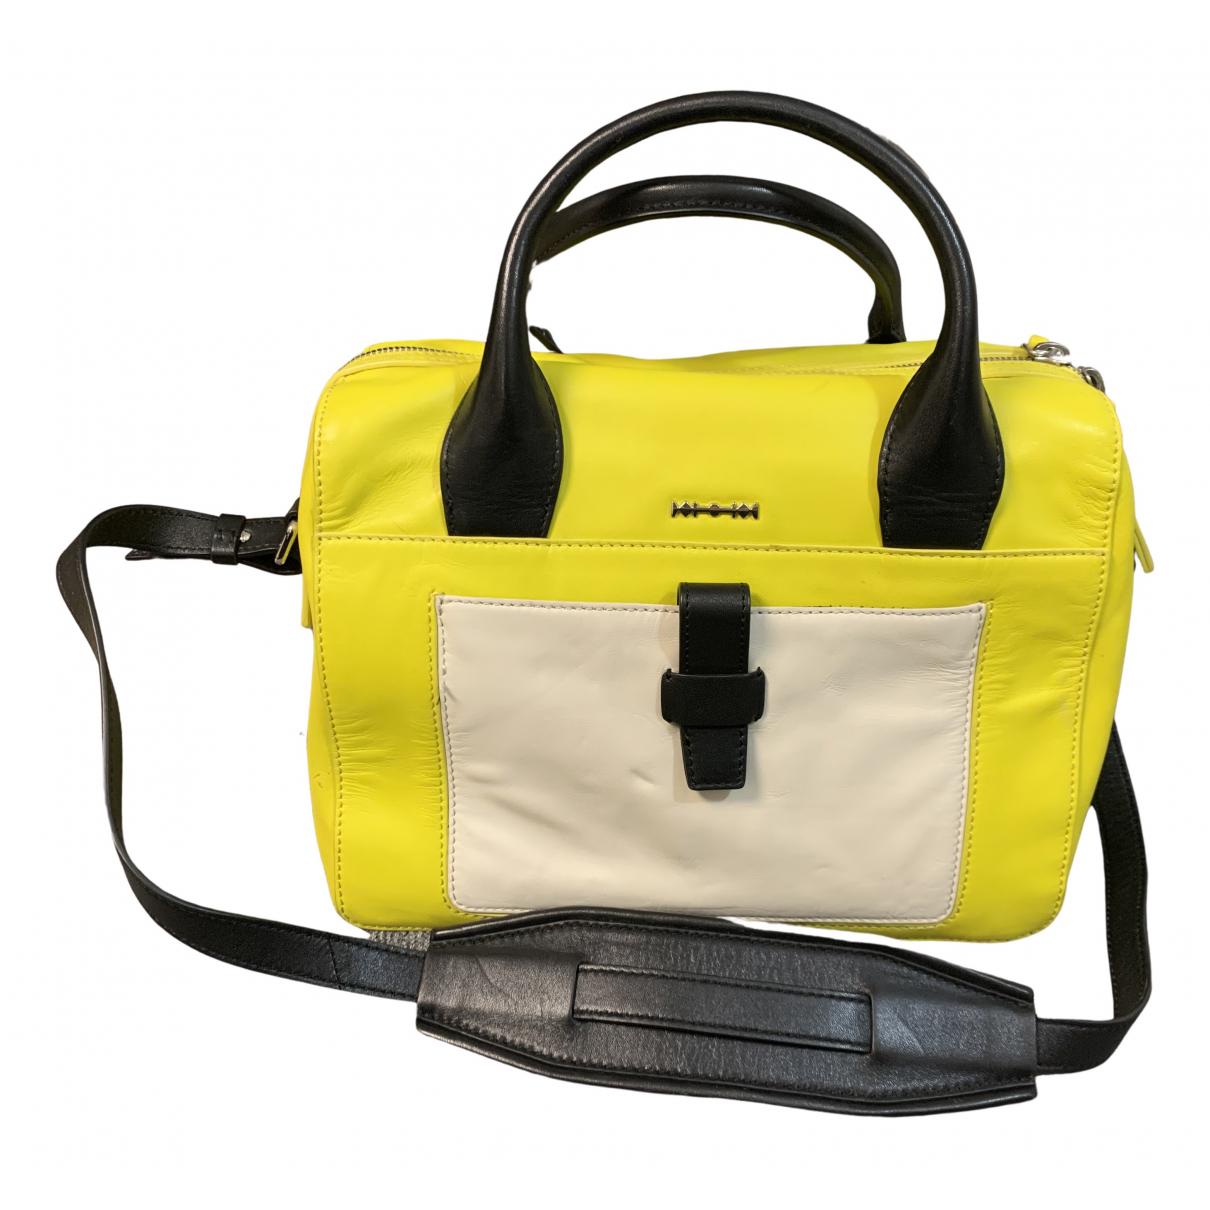 Mcq \N Yellow Leather handbag for Women \N